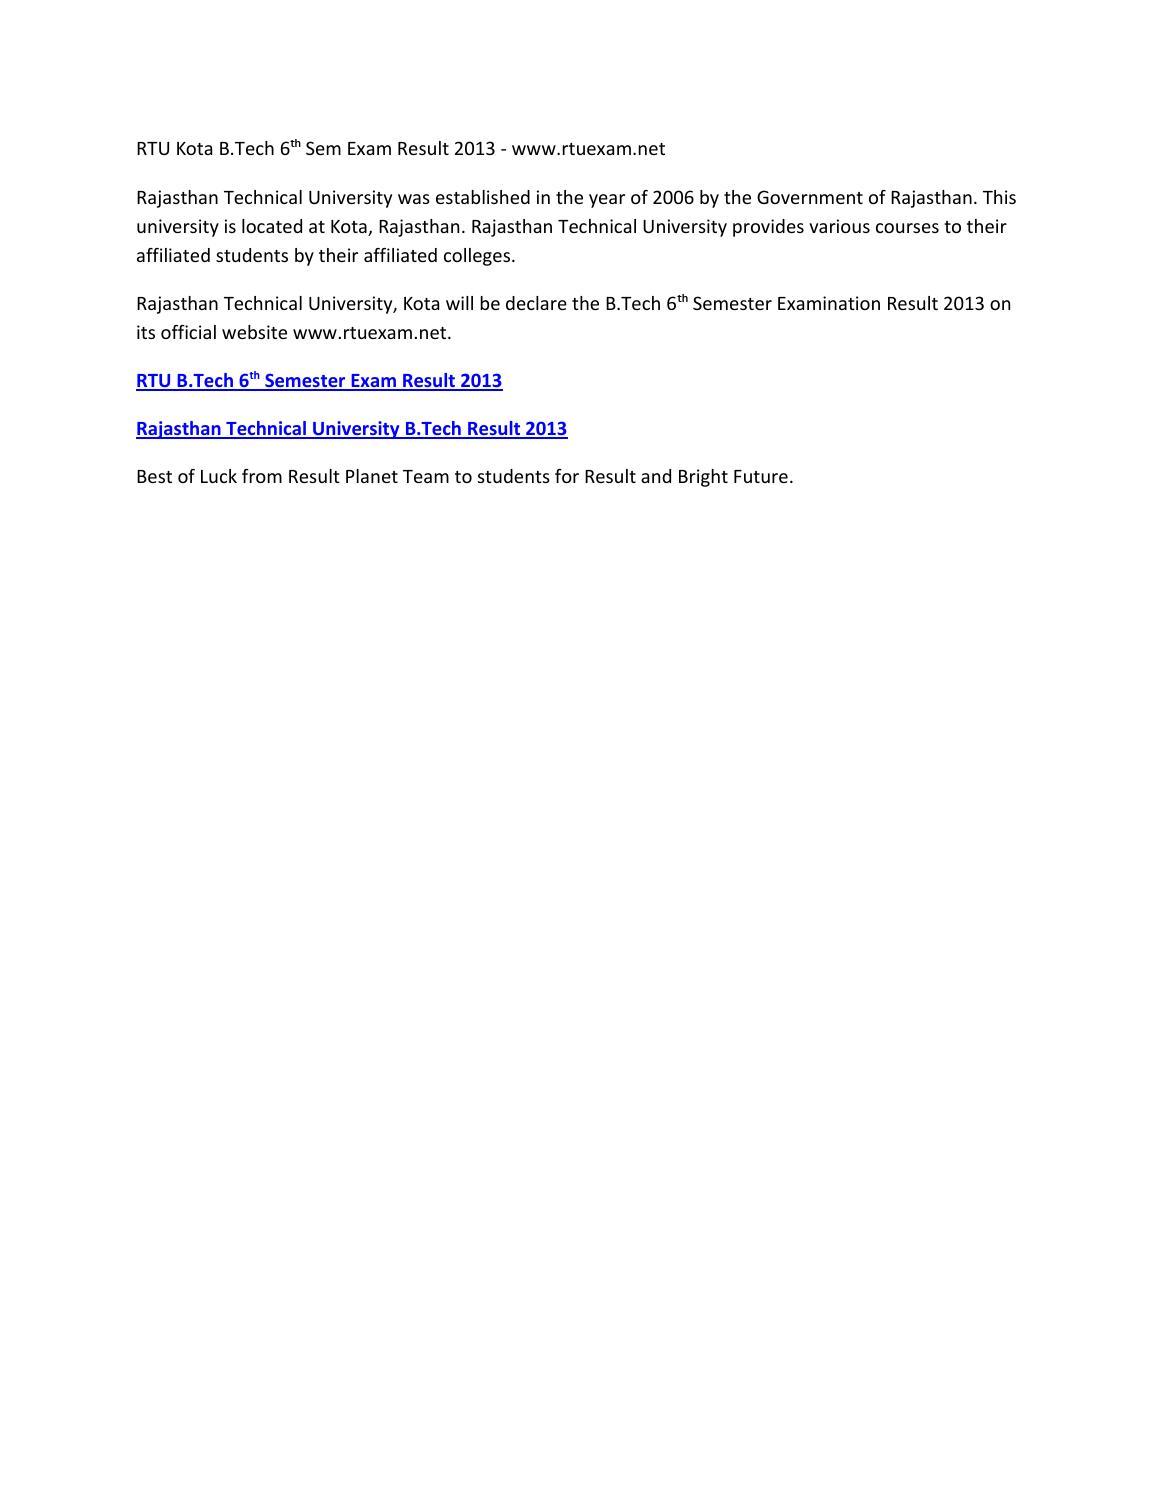 gate electrical by rk kanodia pdf